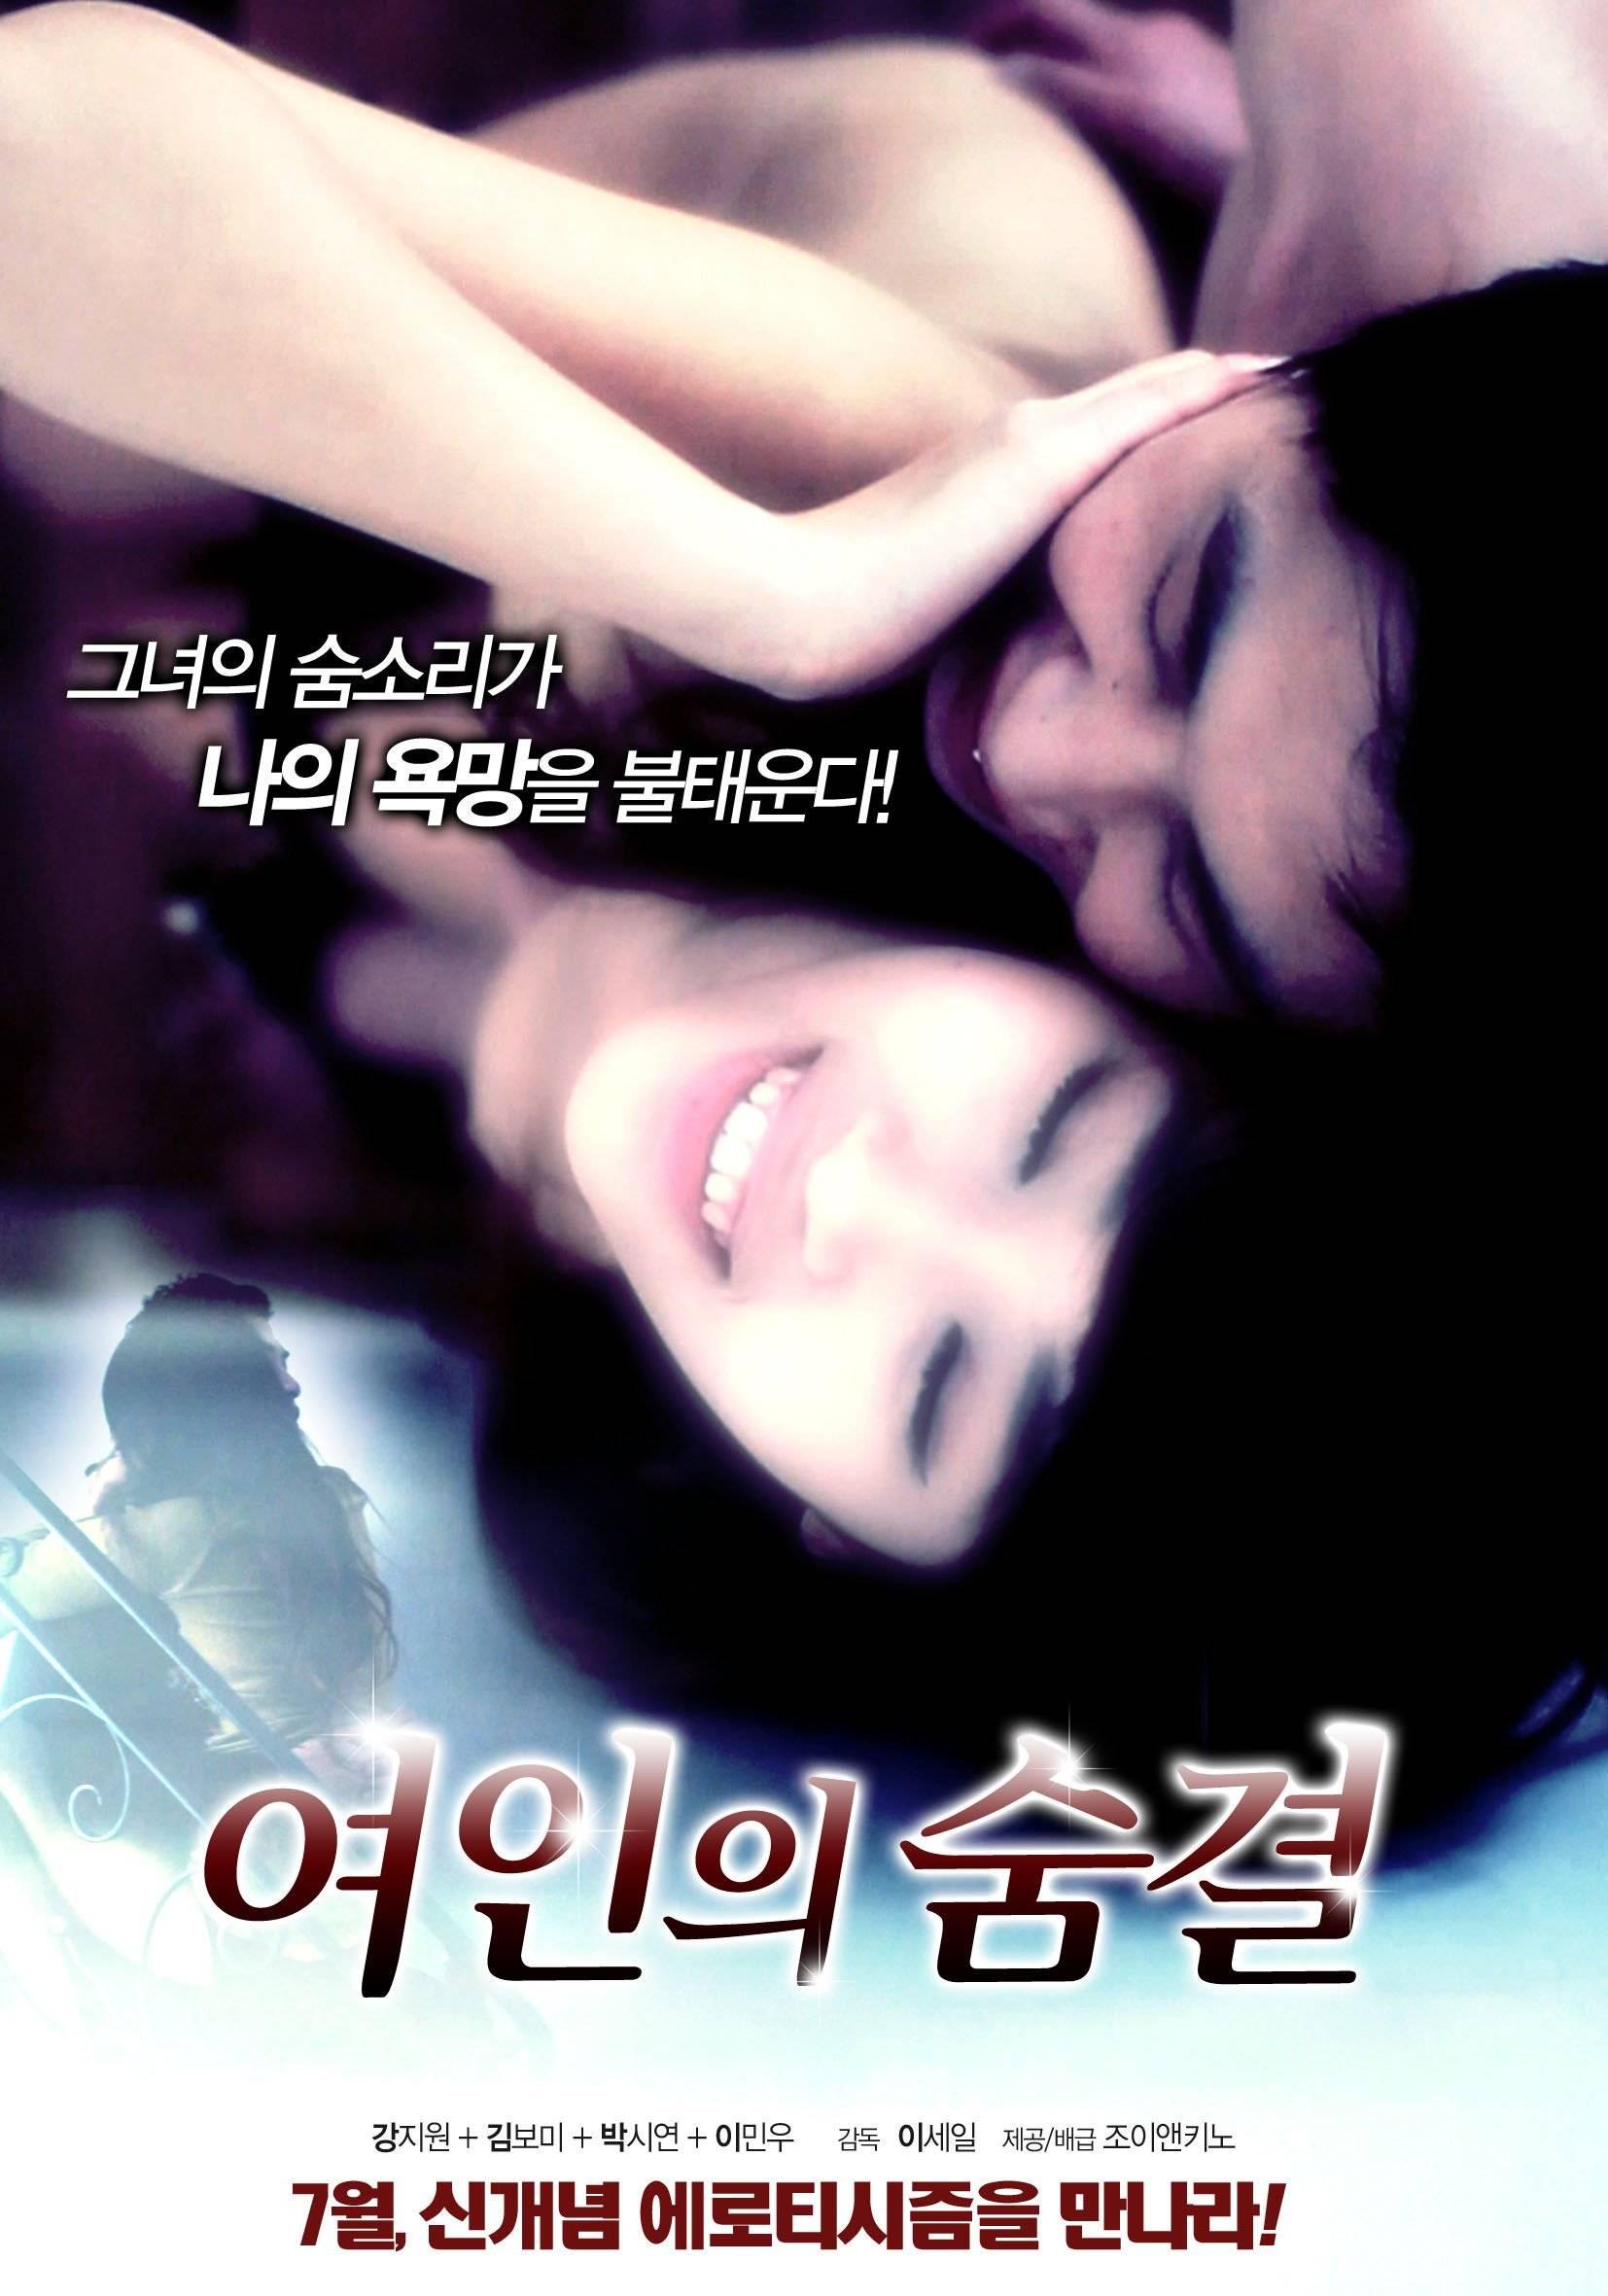 Upcoming Korean movie 'Woman's Breath.